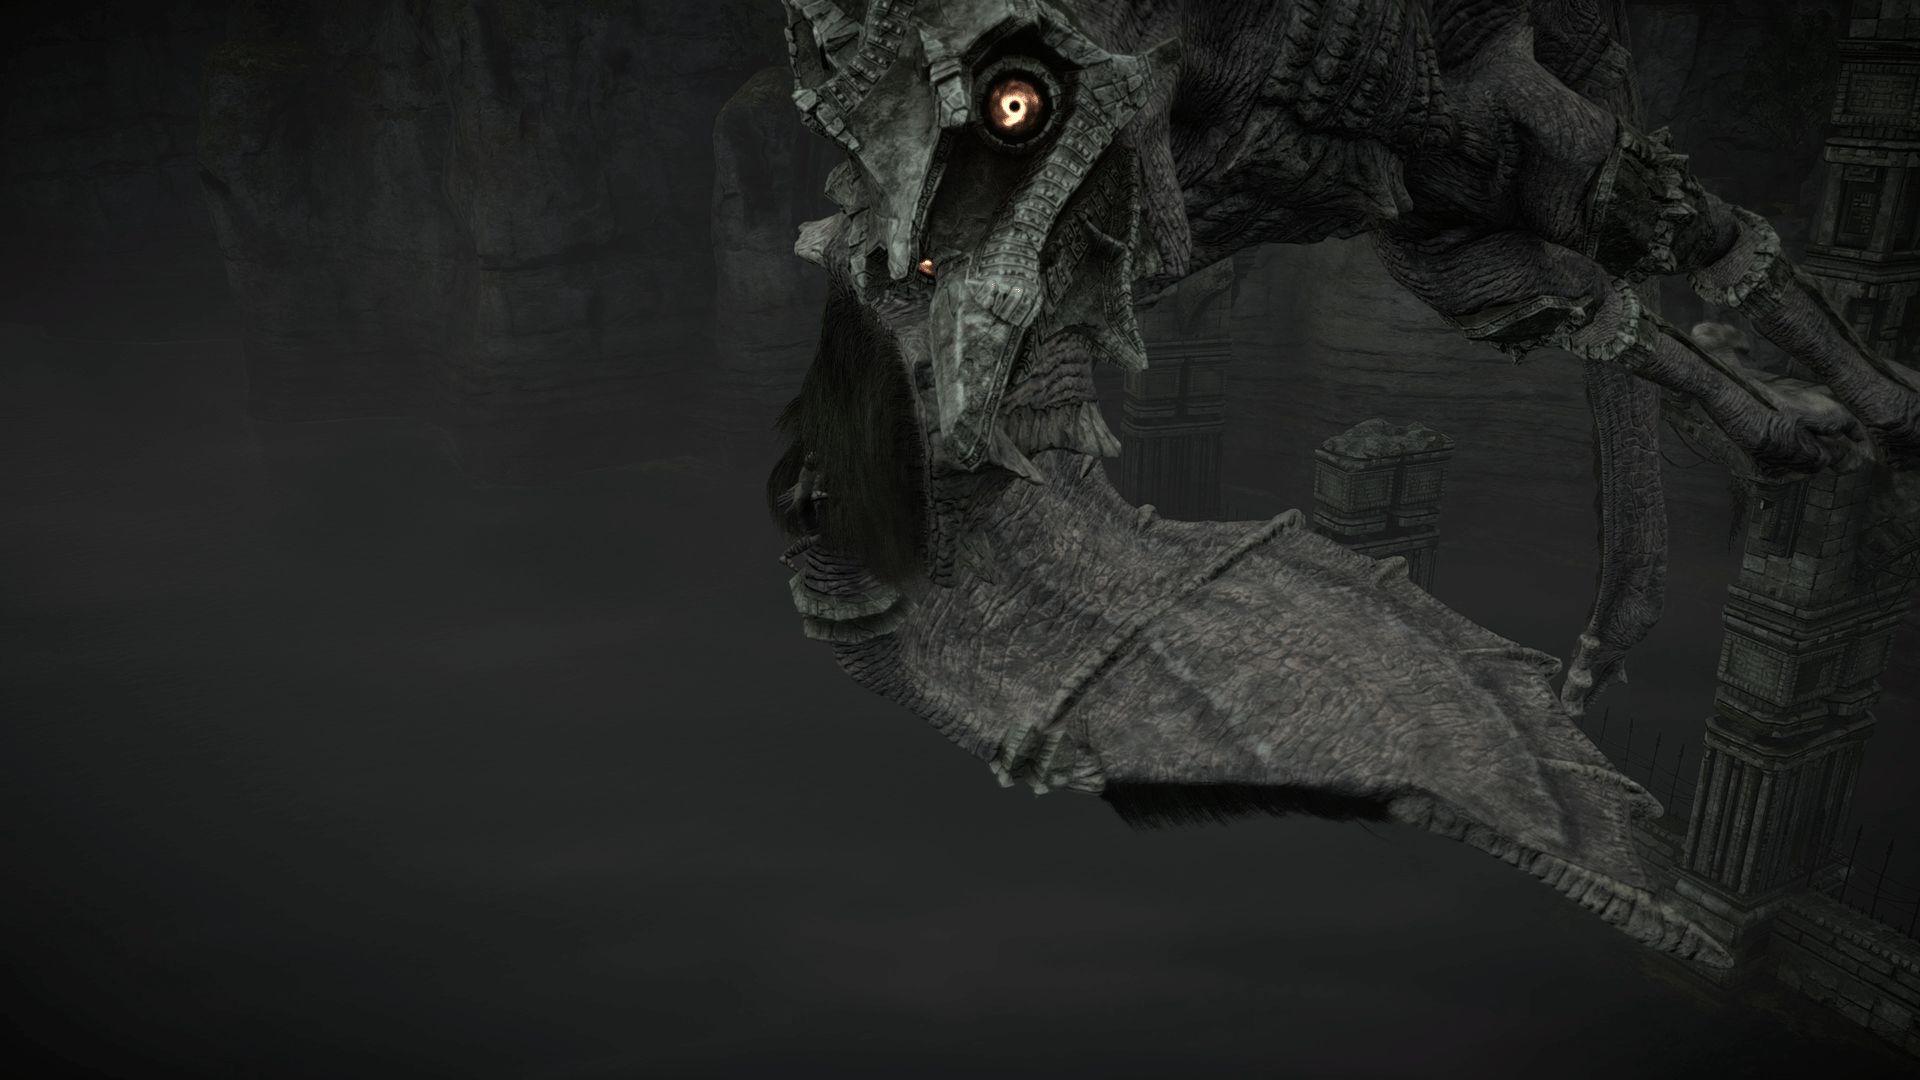 [PS2]旺达与巨像 繁体中文版